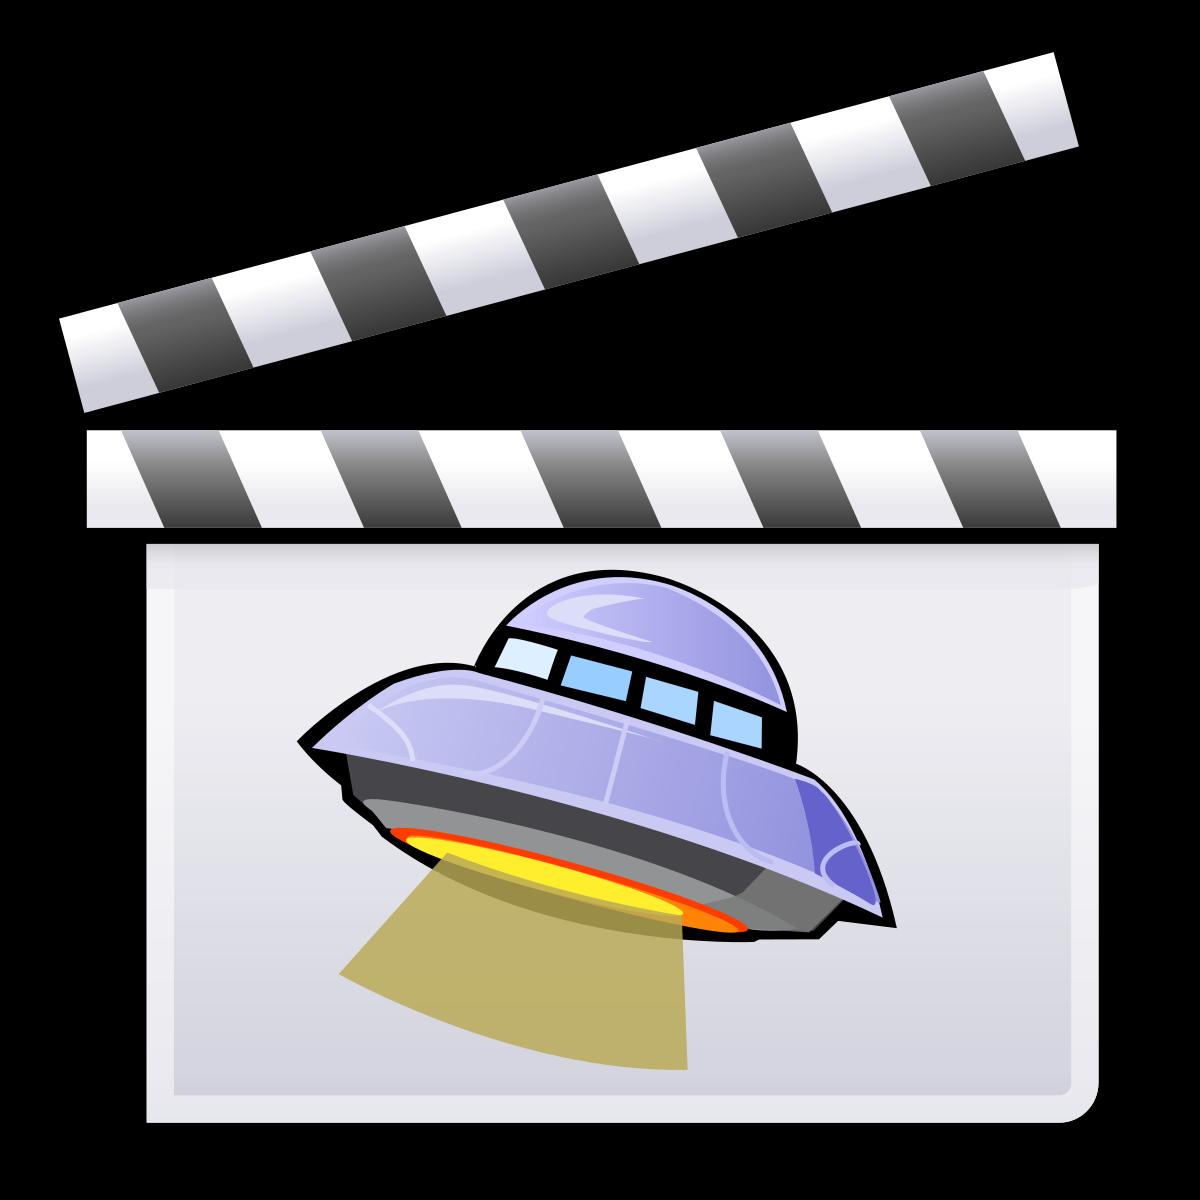 1200x1200 Science Fiction Film